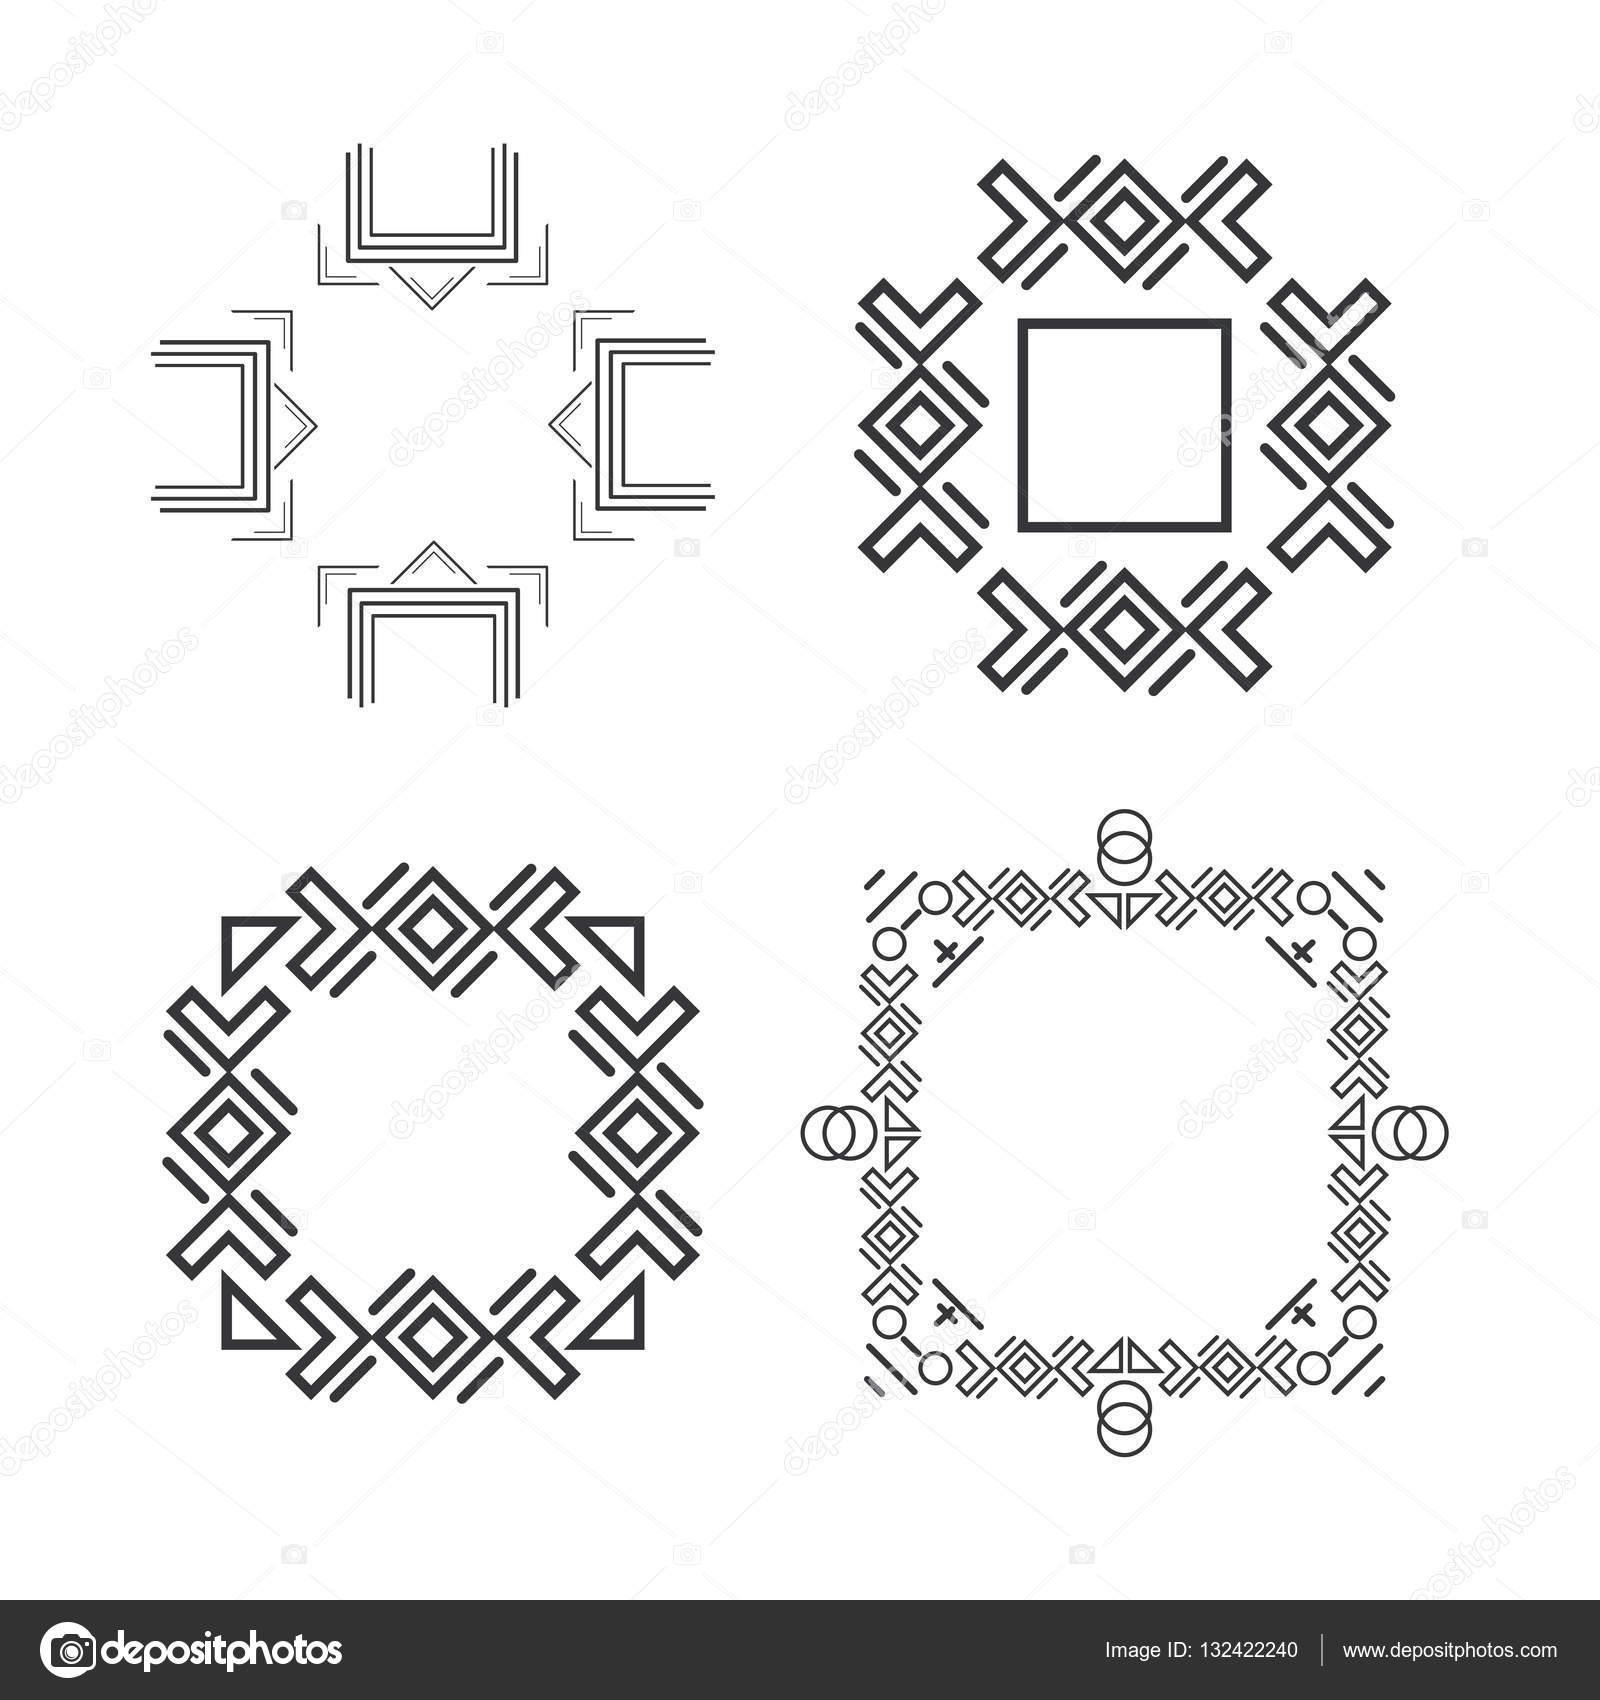 Set of trendy geometric shapes hipster frames collection stock set of trendy geometric shapes hipster frames collection stock vector jeuxipadfo Images